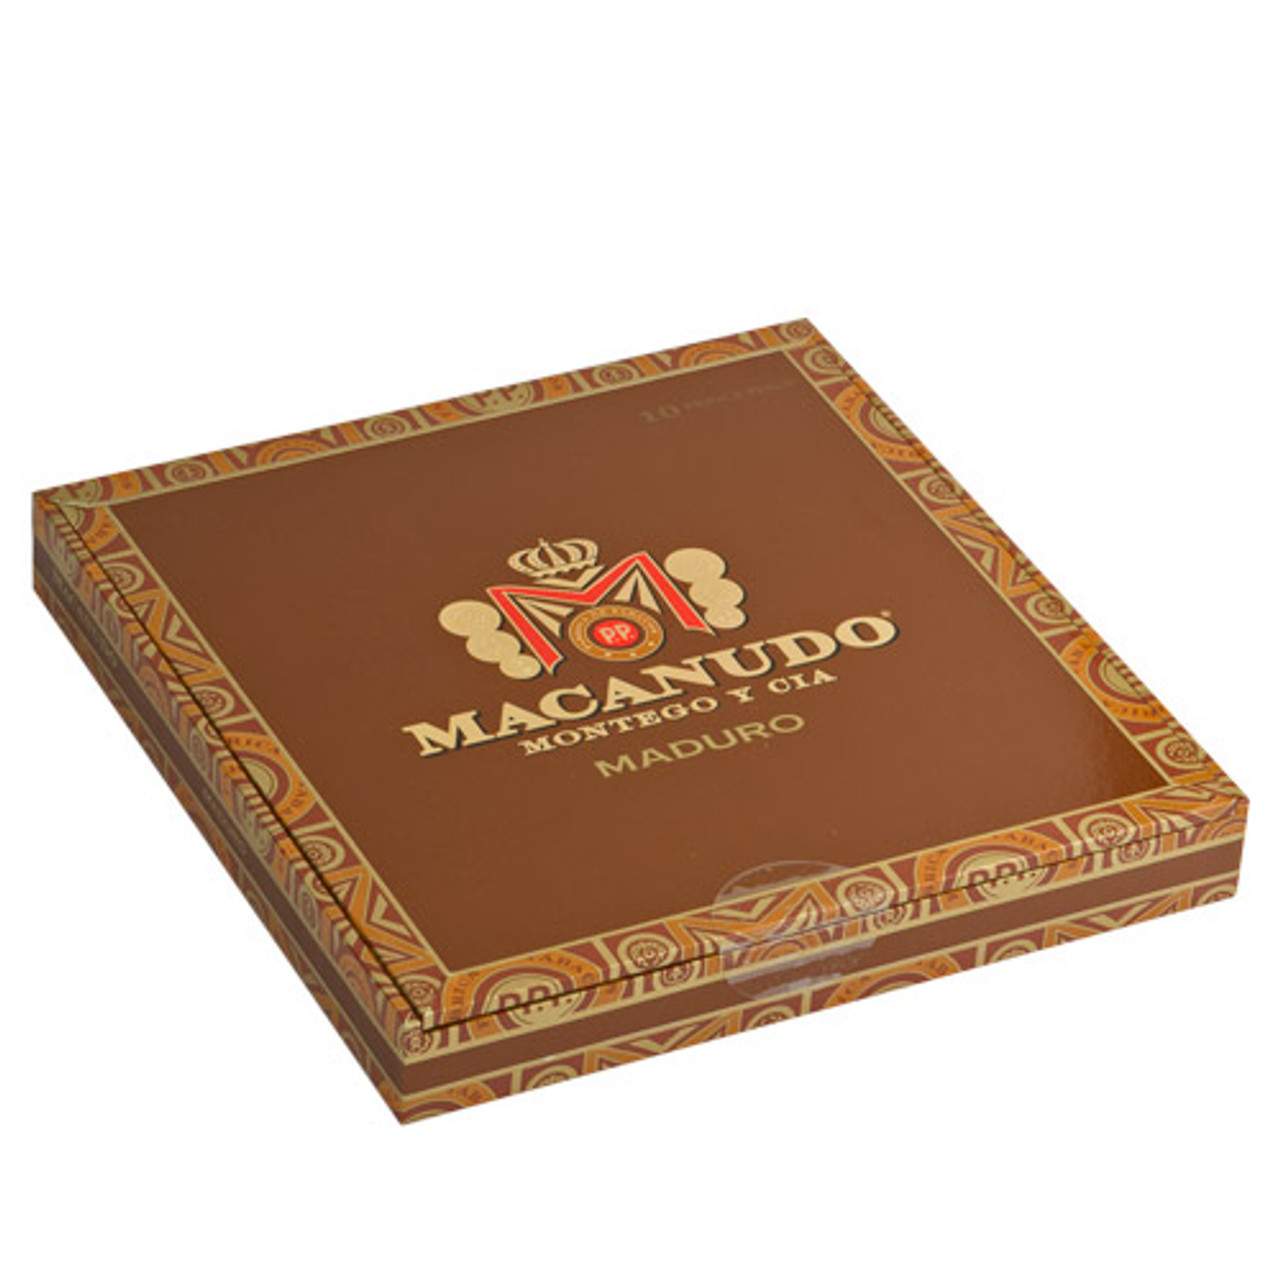 Macanudo Maduro Gigante Cigars - 6 x 60 (Box of 25)